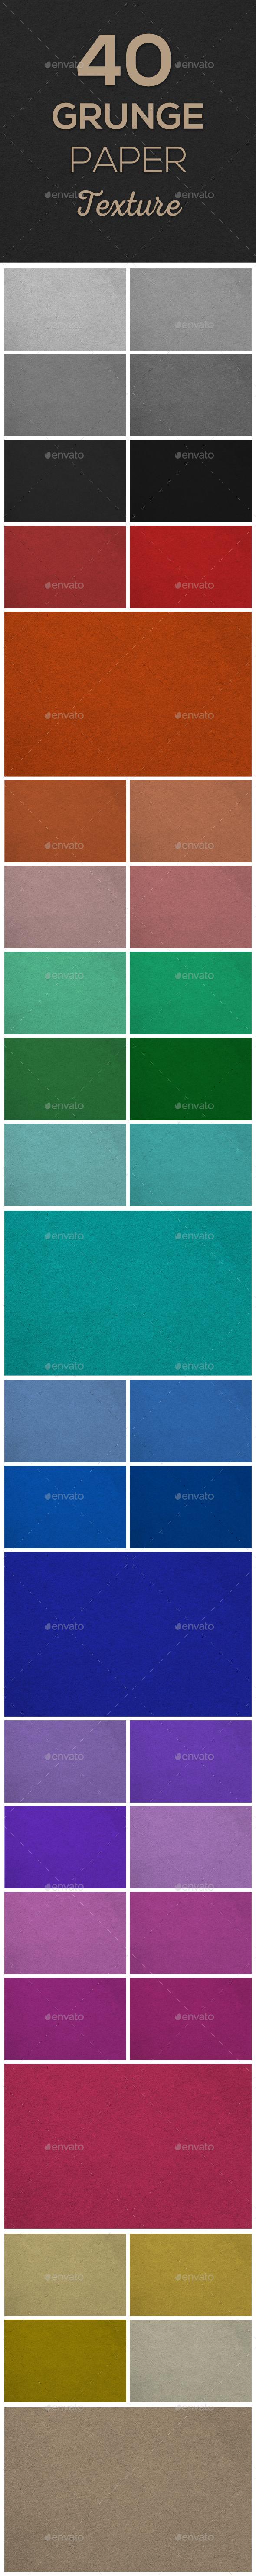 40 Grunge Paper Texture - Paper Textures